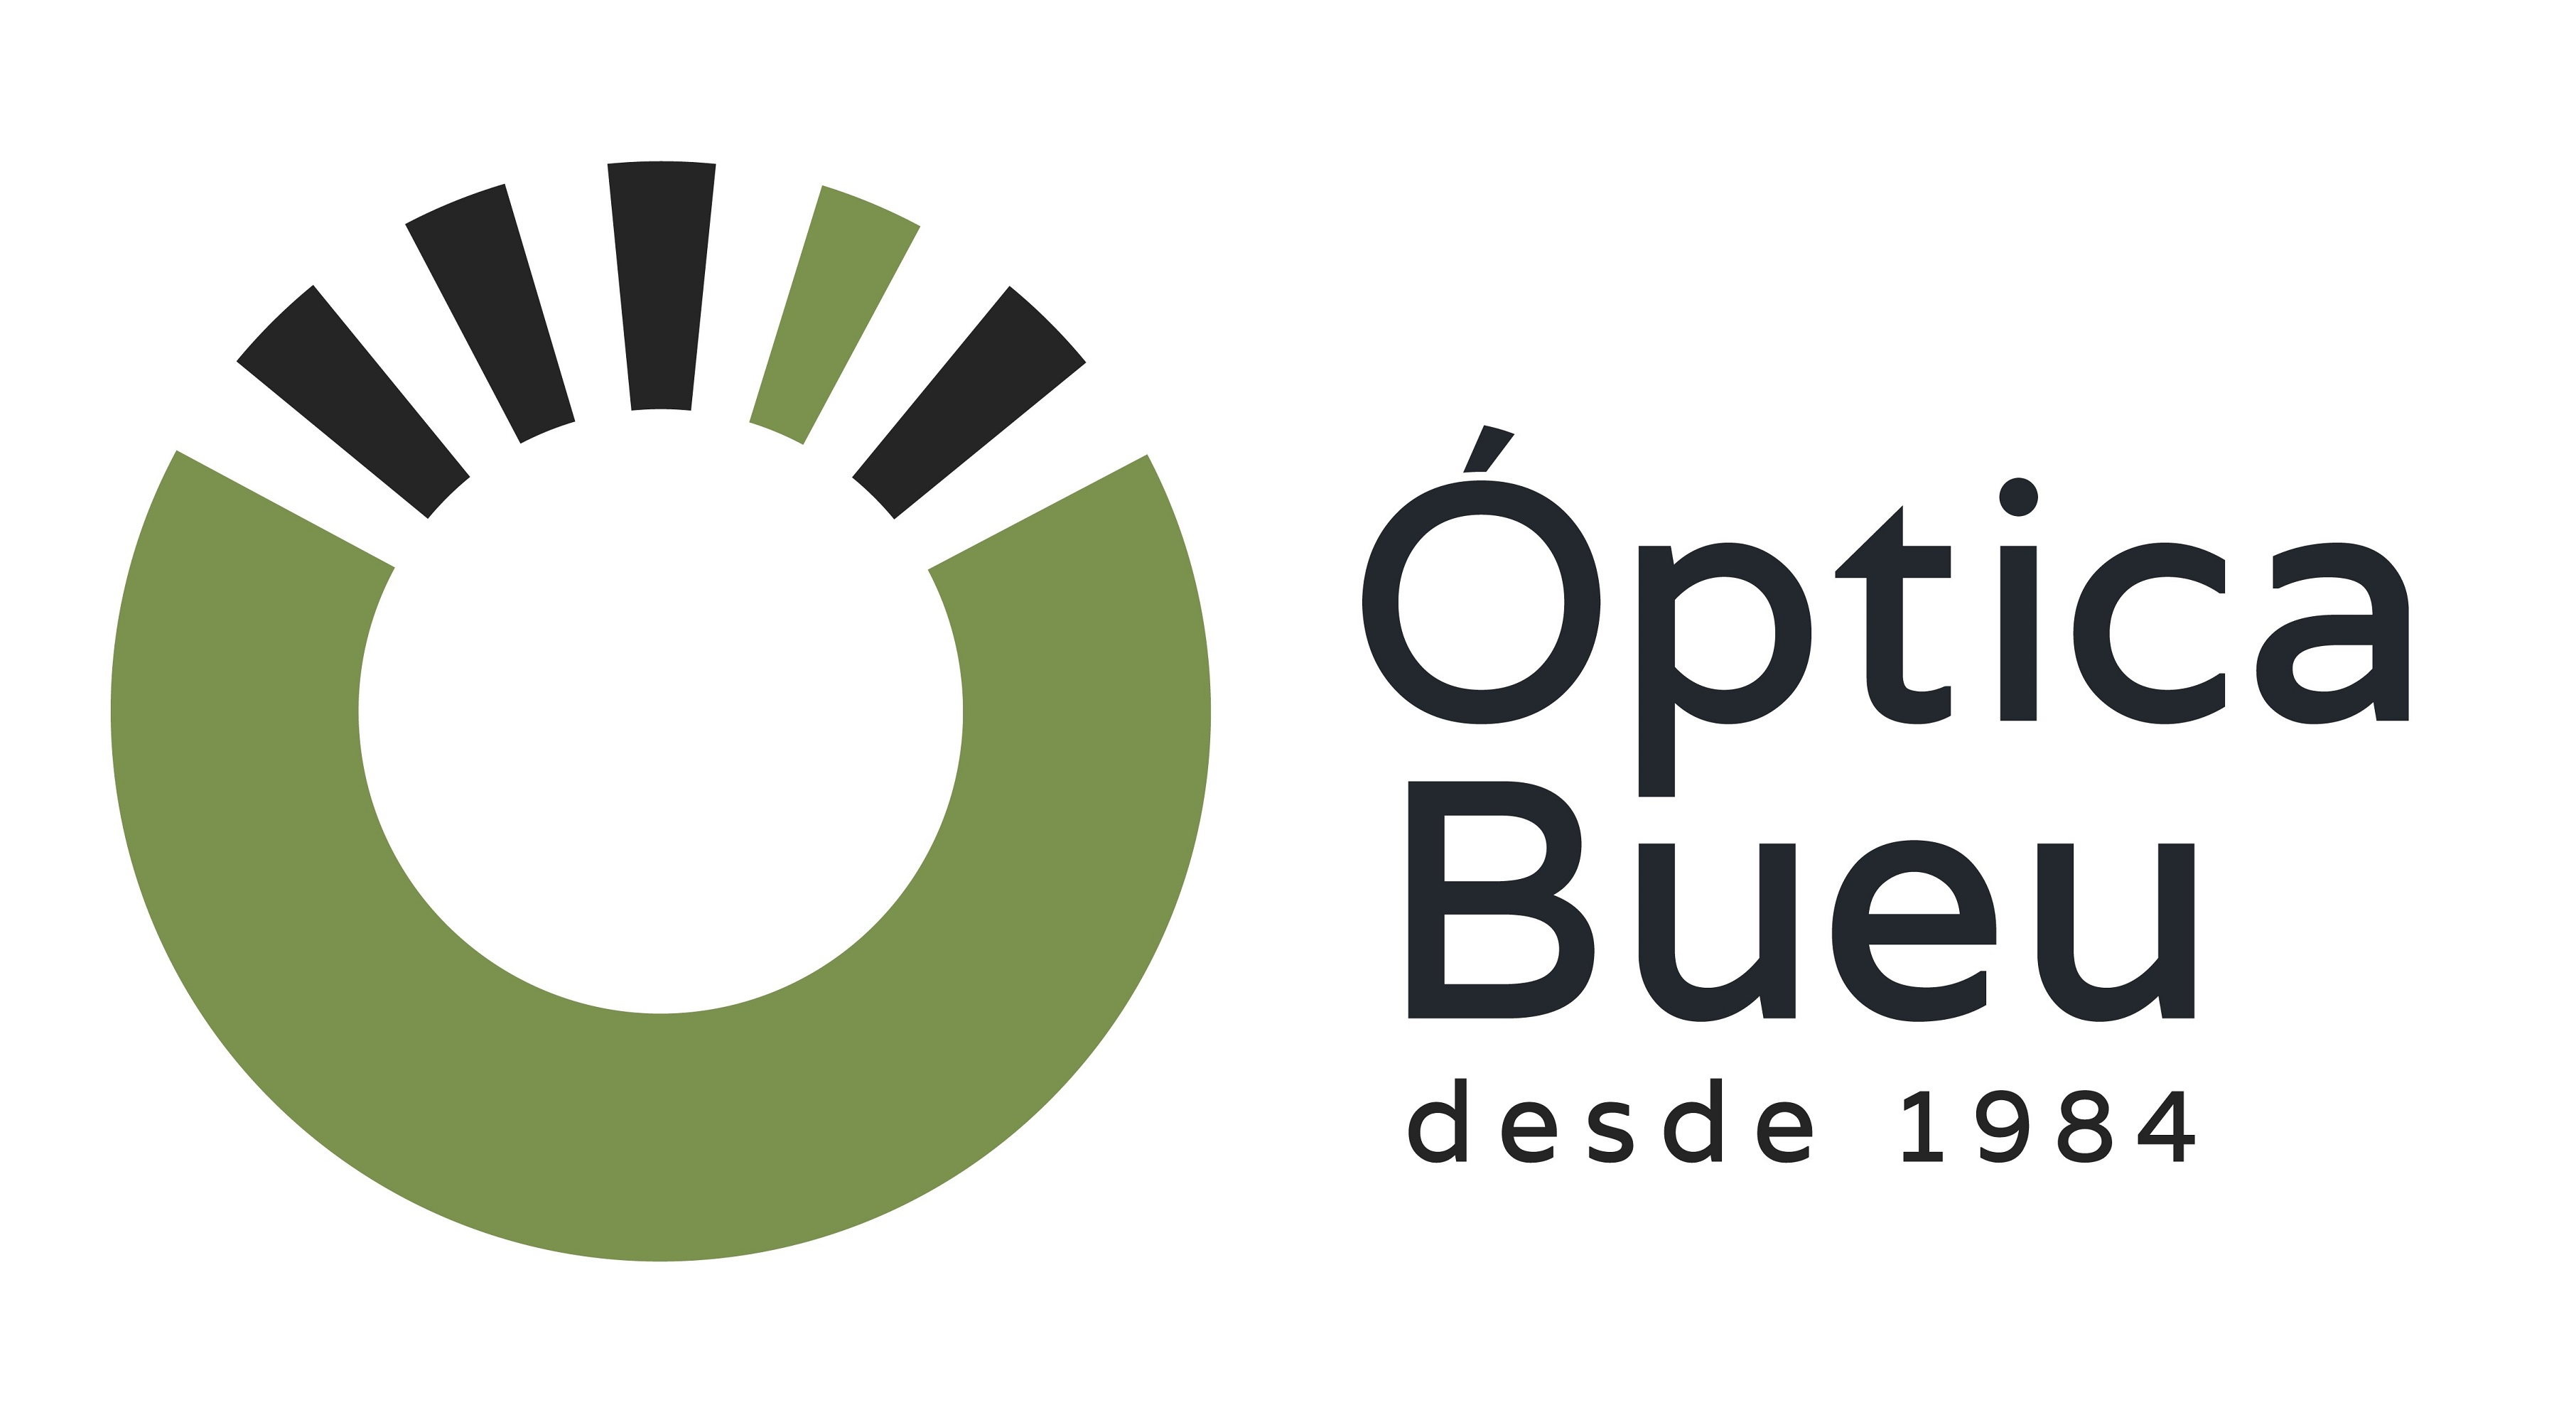 OPTICA BUEU